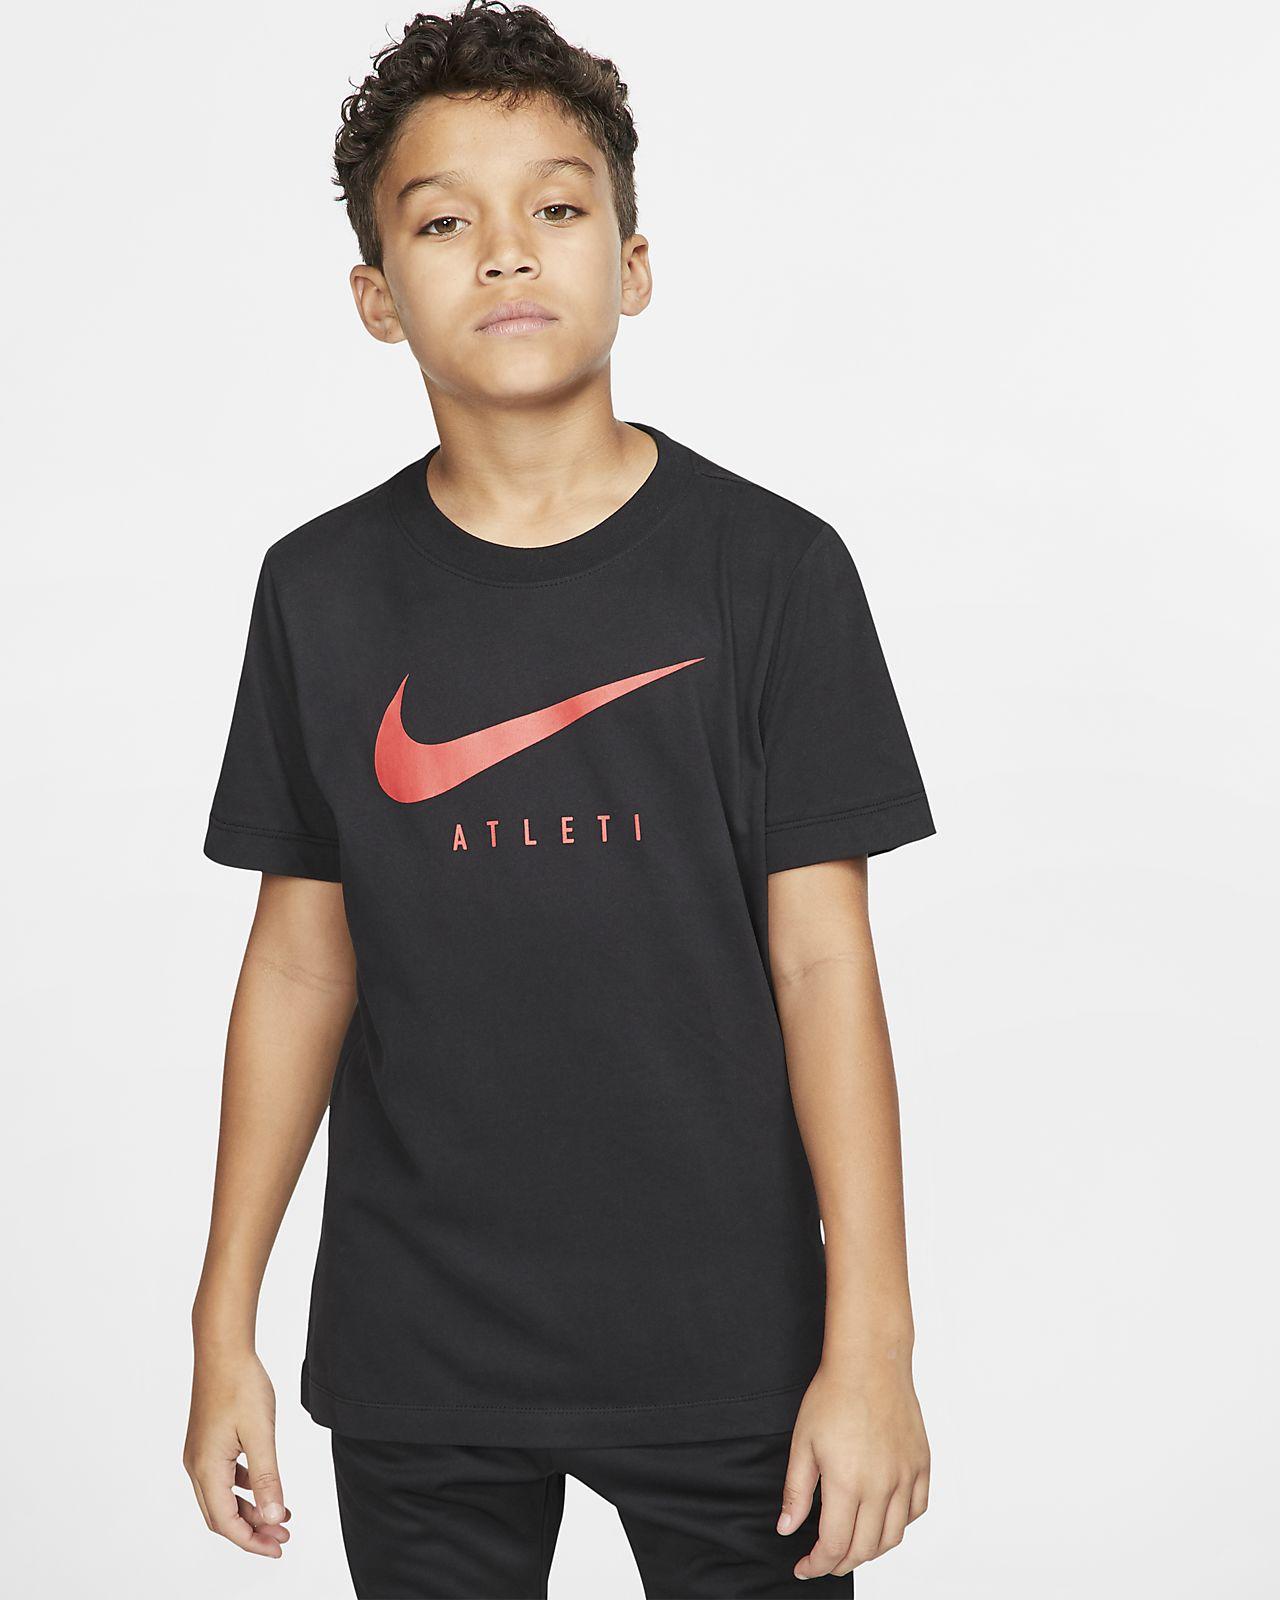 Nike Dri-FIT Atlético de Madrid Older Kids' Football T-Shirt